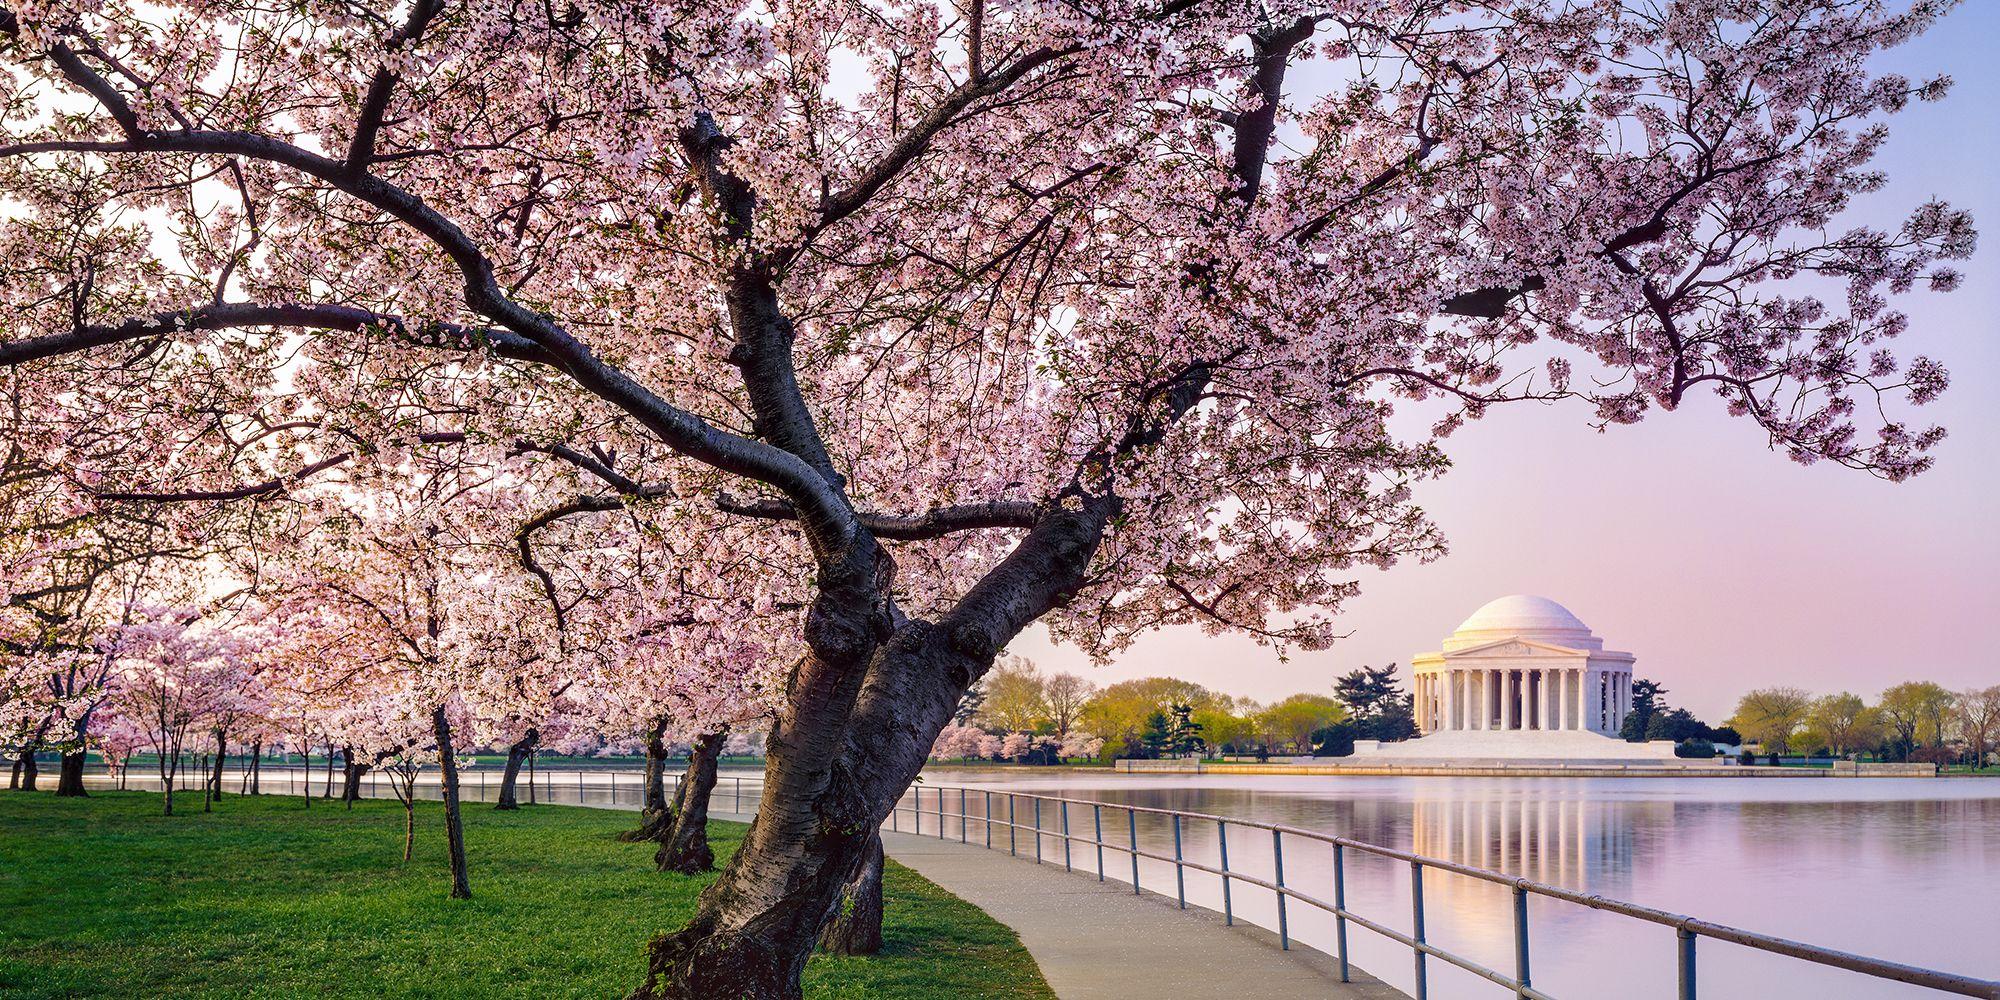 East Potomac Park, Washington, D.C.